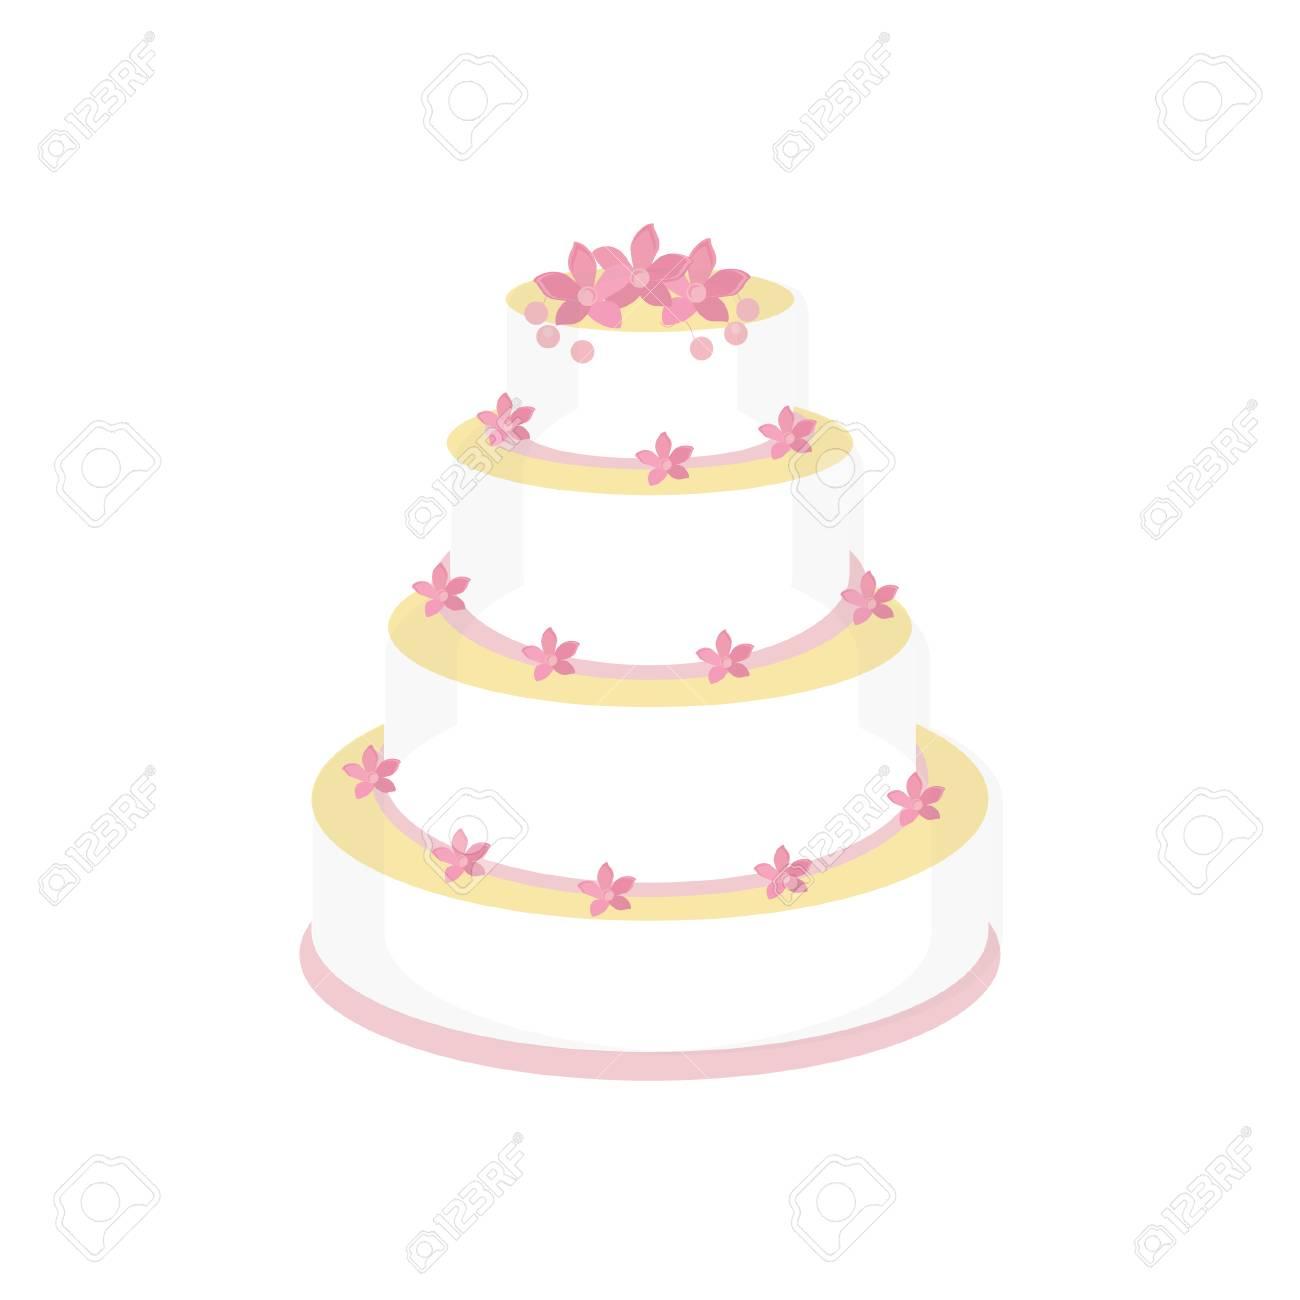 Wedding cake with pink flowers raster isolated wedding invitation stock photo wedding cake with pink flowers raster isolated wedding invitation mightylinksfo